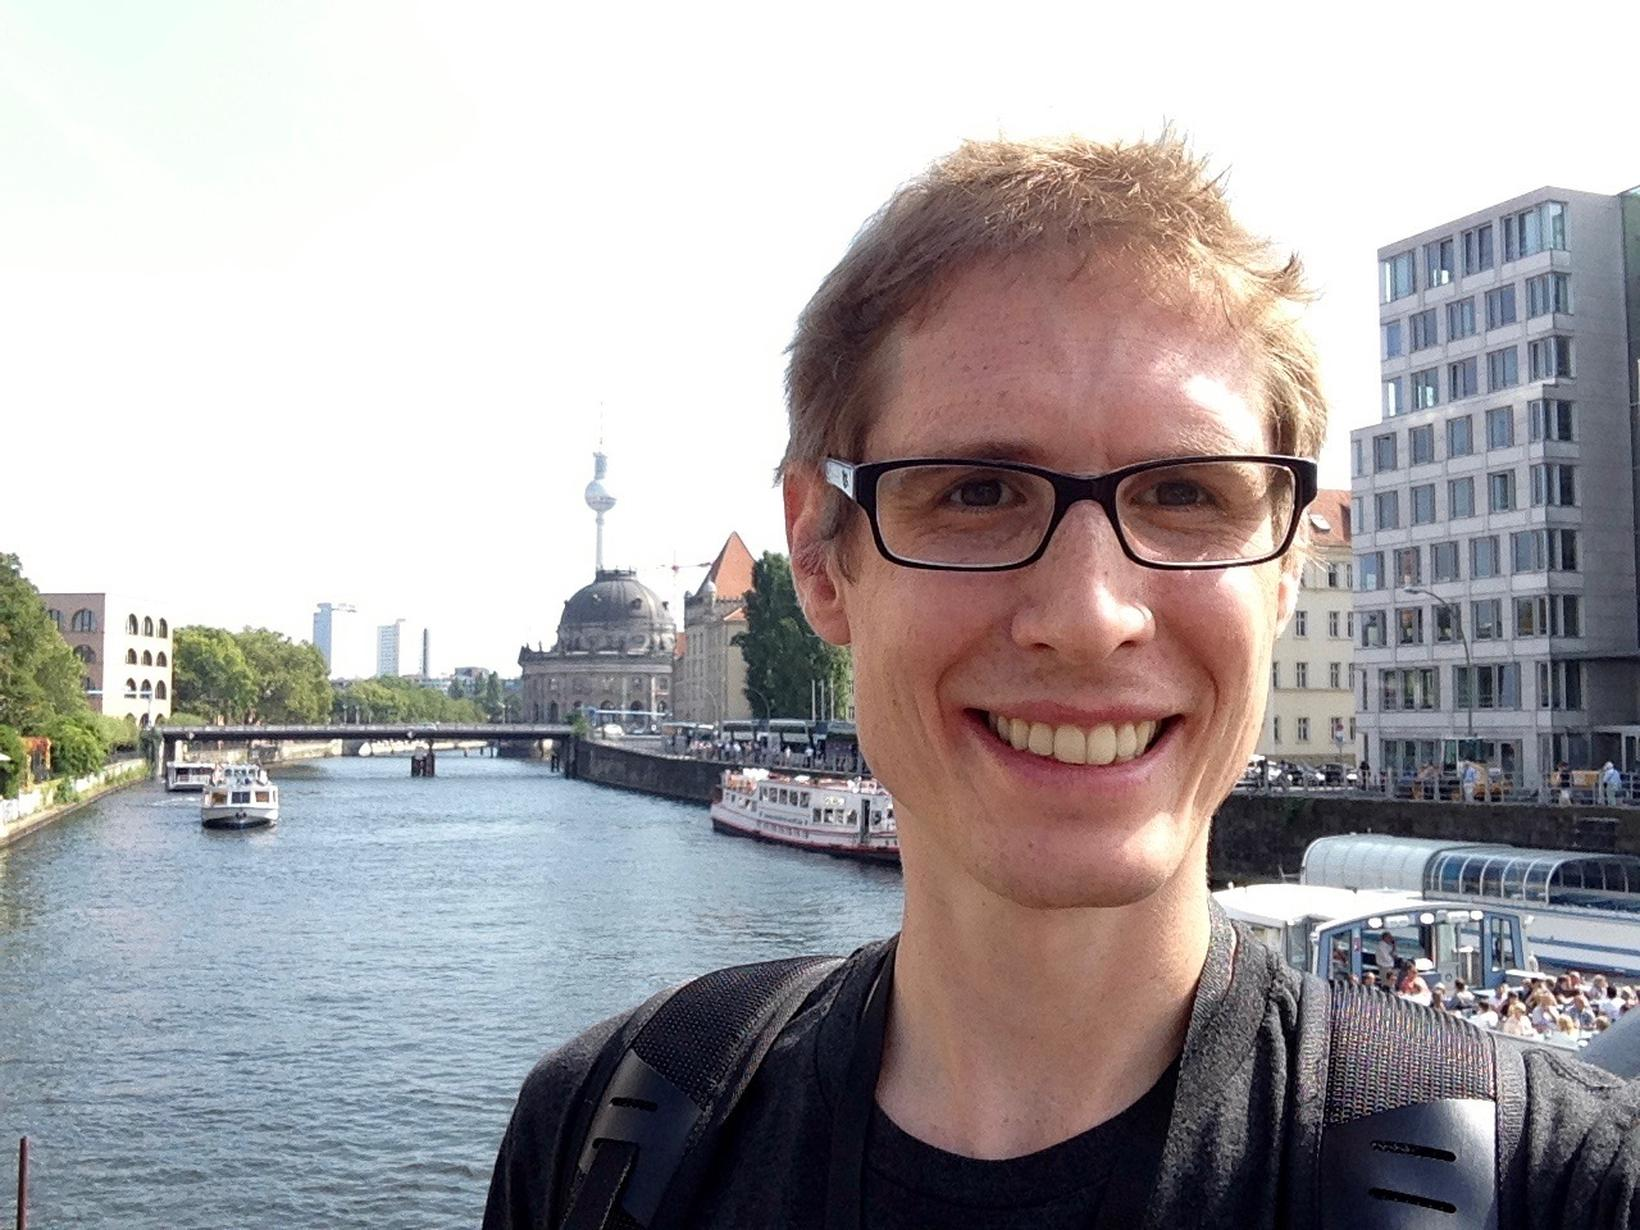 Robert from Hamburg, Germany